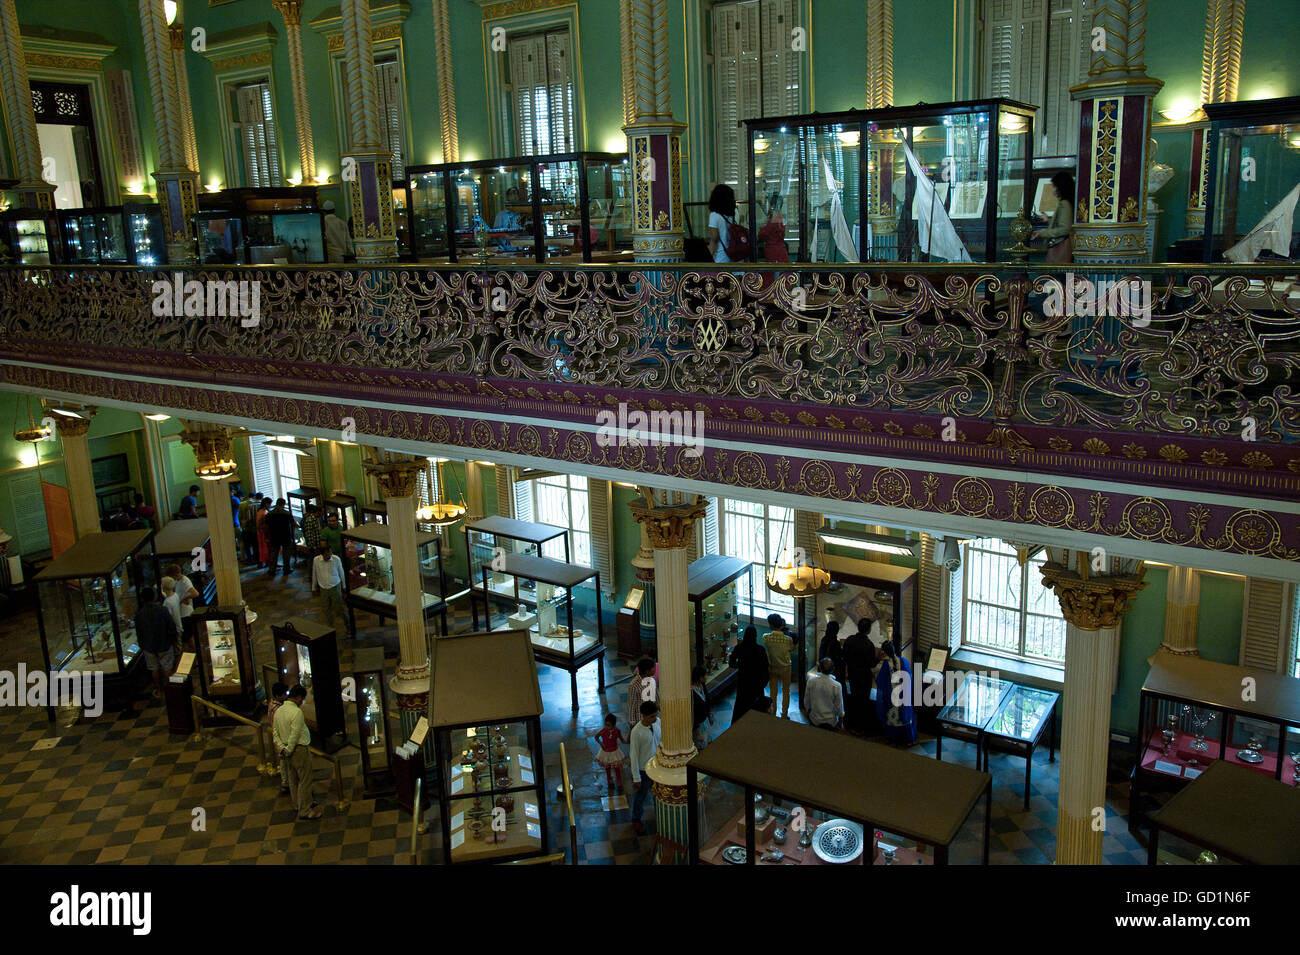 The image of Bhau Daji Lad Museum was taken in Mumbai, India - Stock Image